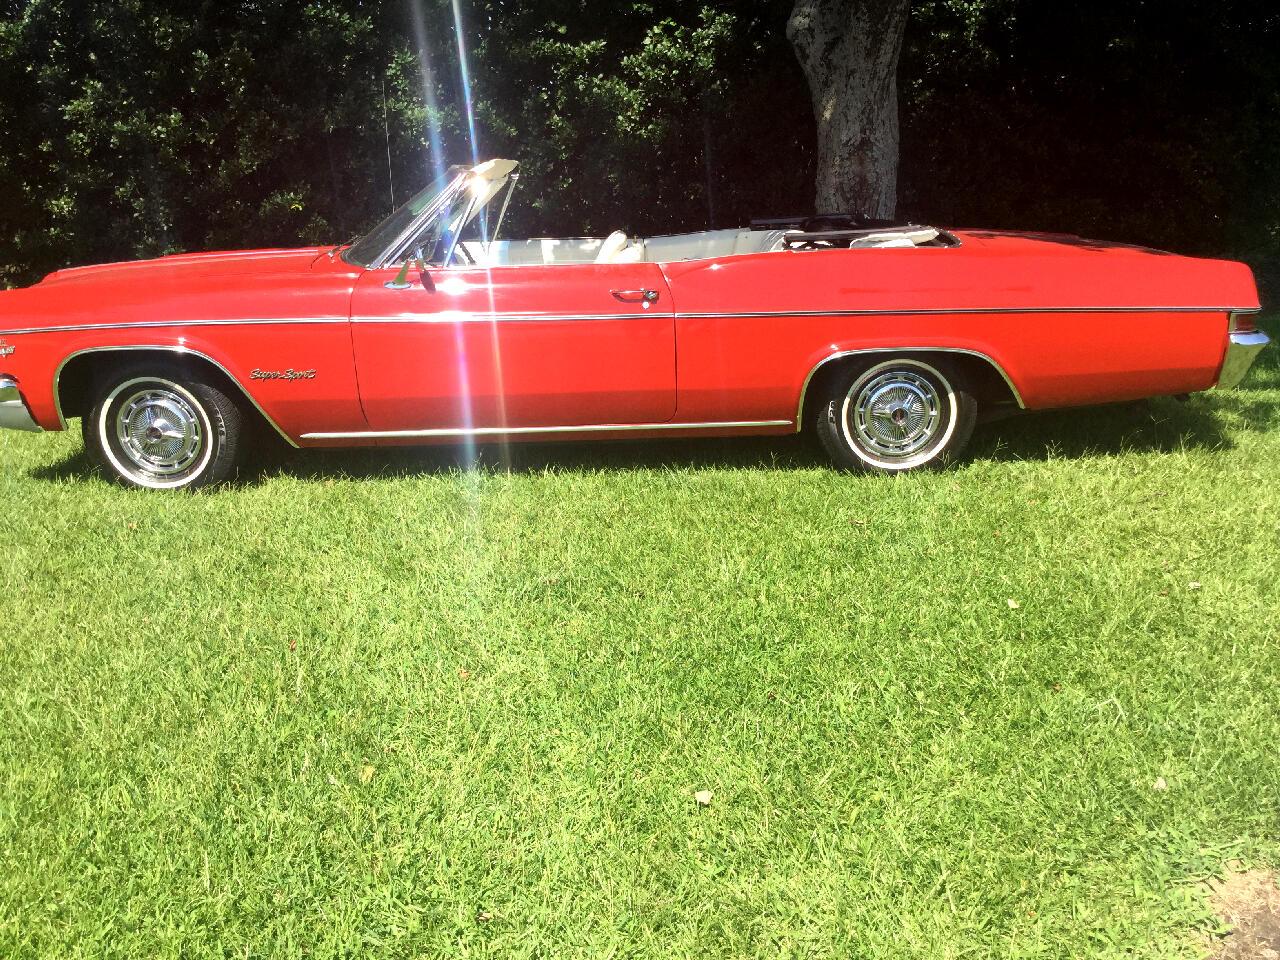 1966 Chevrolet Caprice Classic/Impala SS